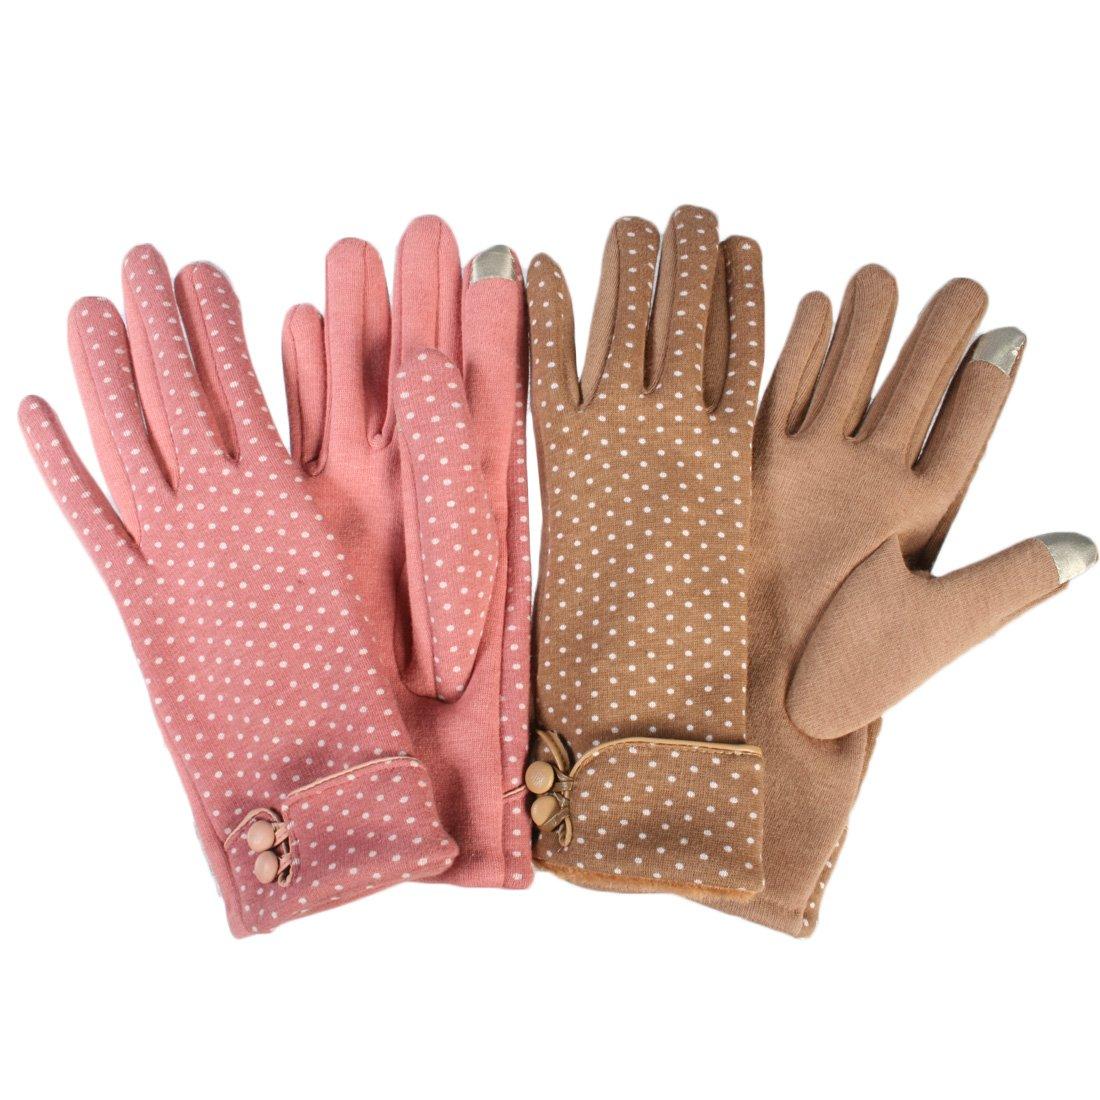 kilofly Women's Touchscreen Texting Smartphone Warm Winter Gloves, 2 Pairs Set